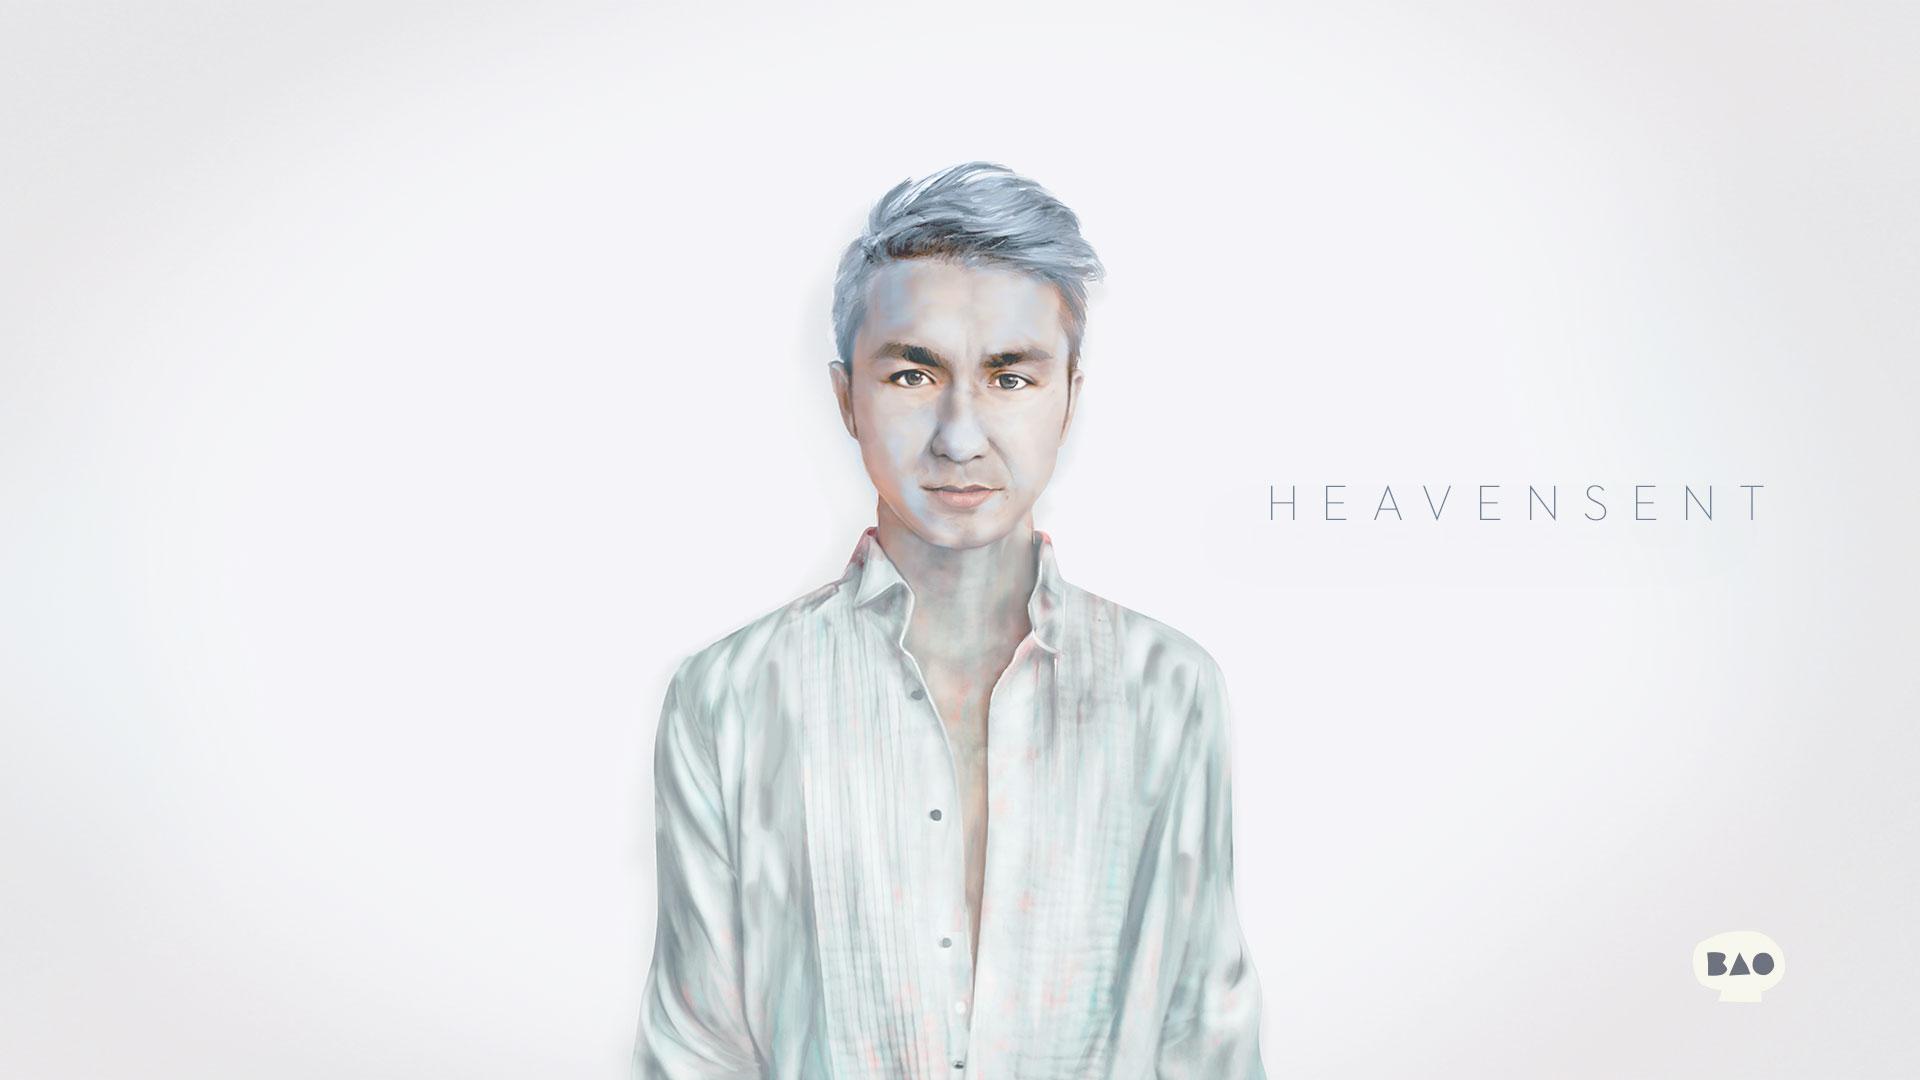 New Release: Heavensent